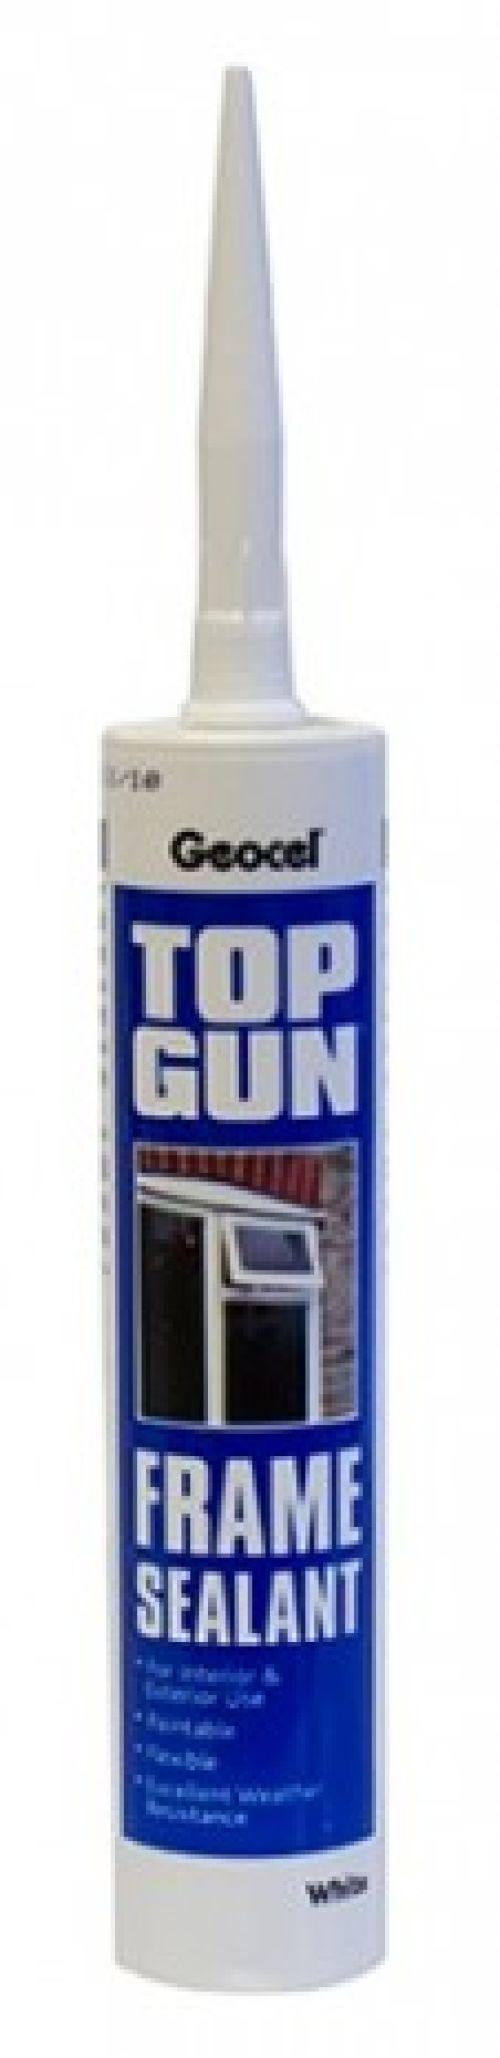 Top Gun Frame Seal